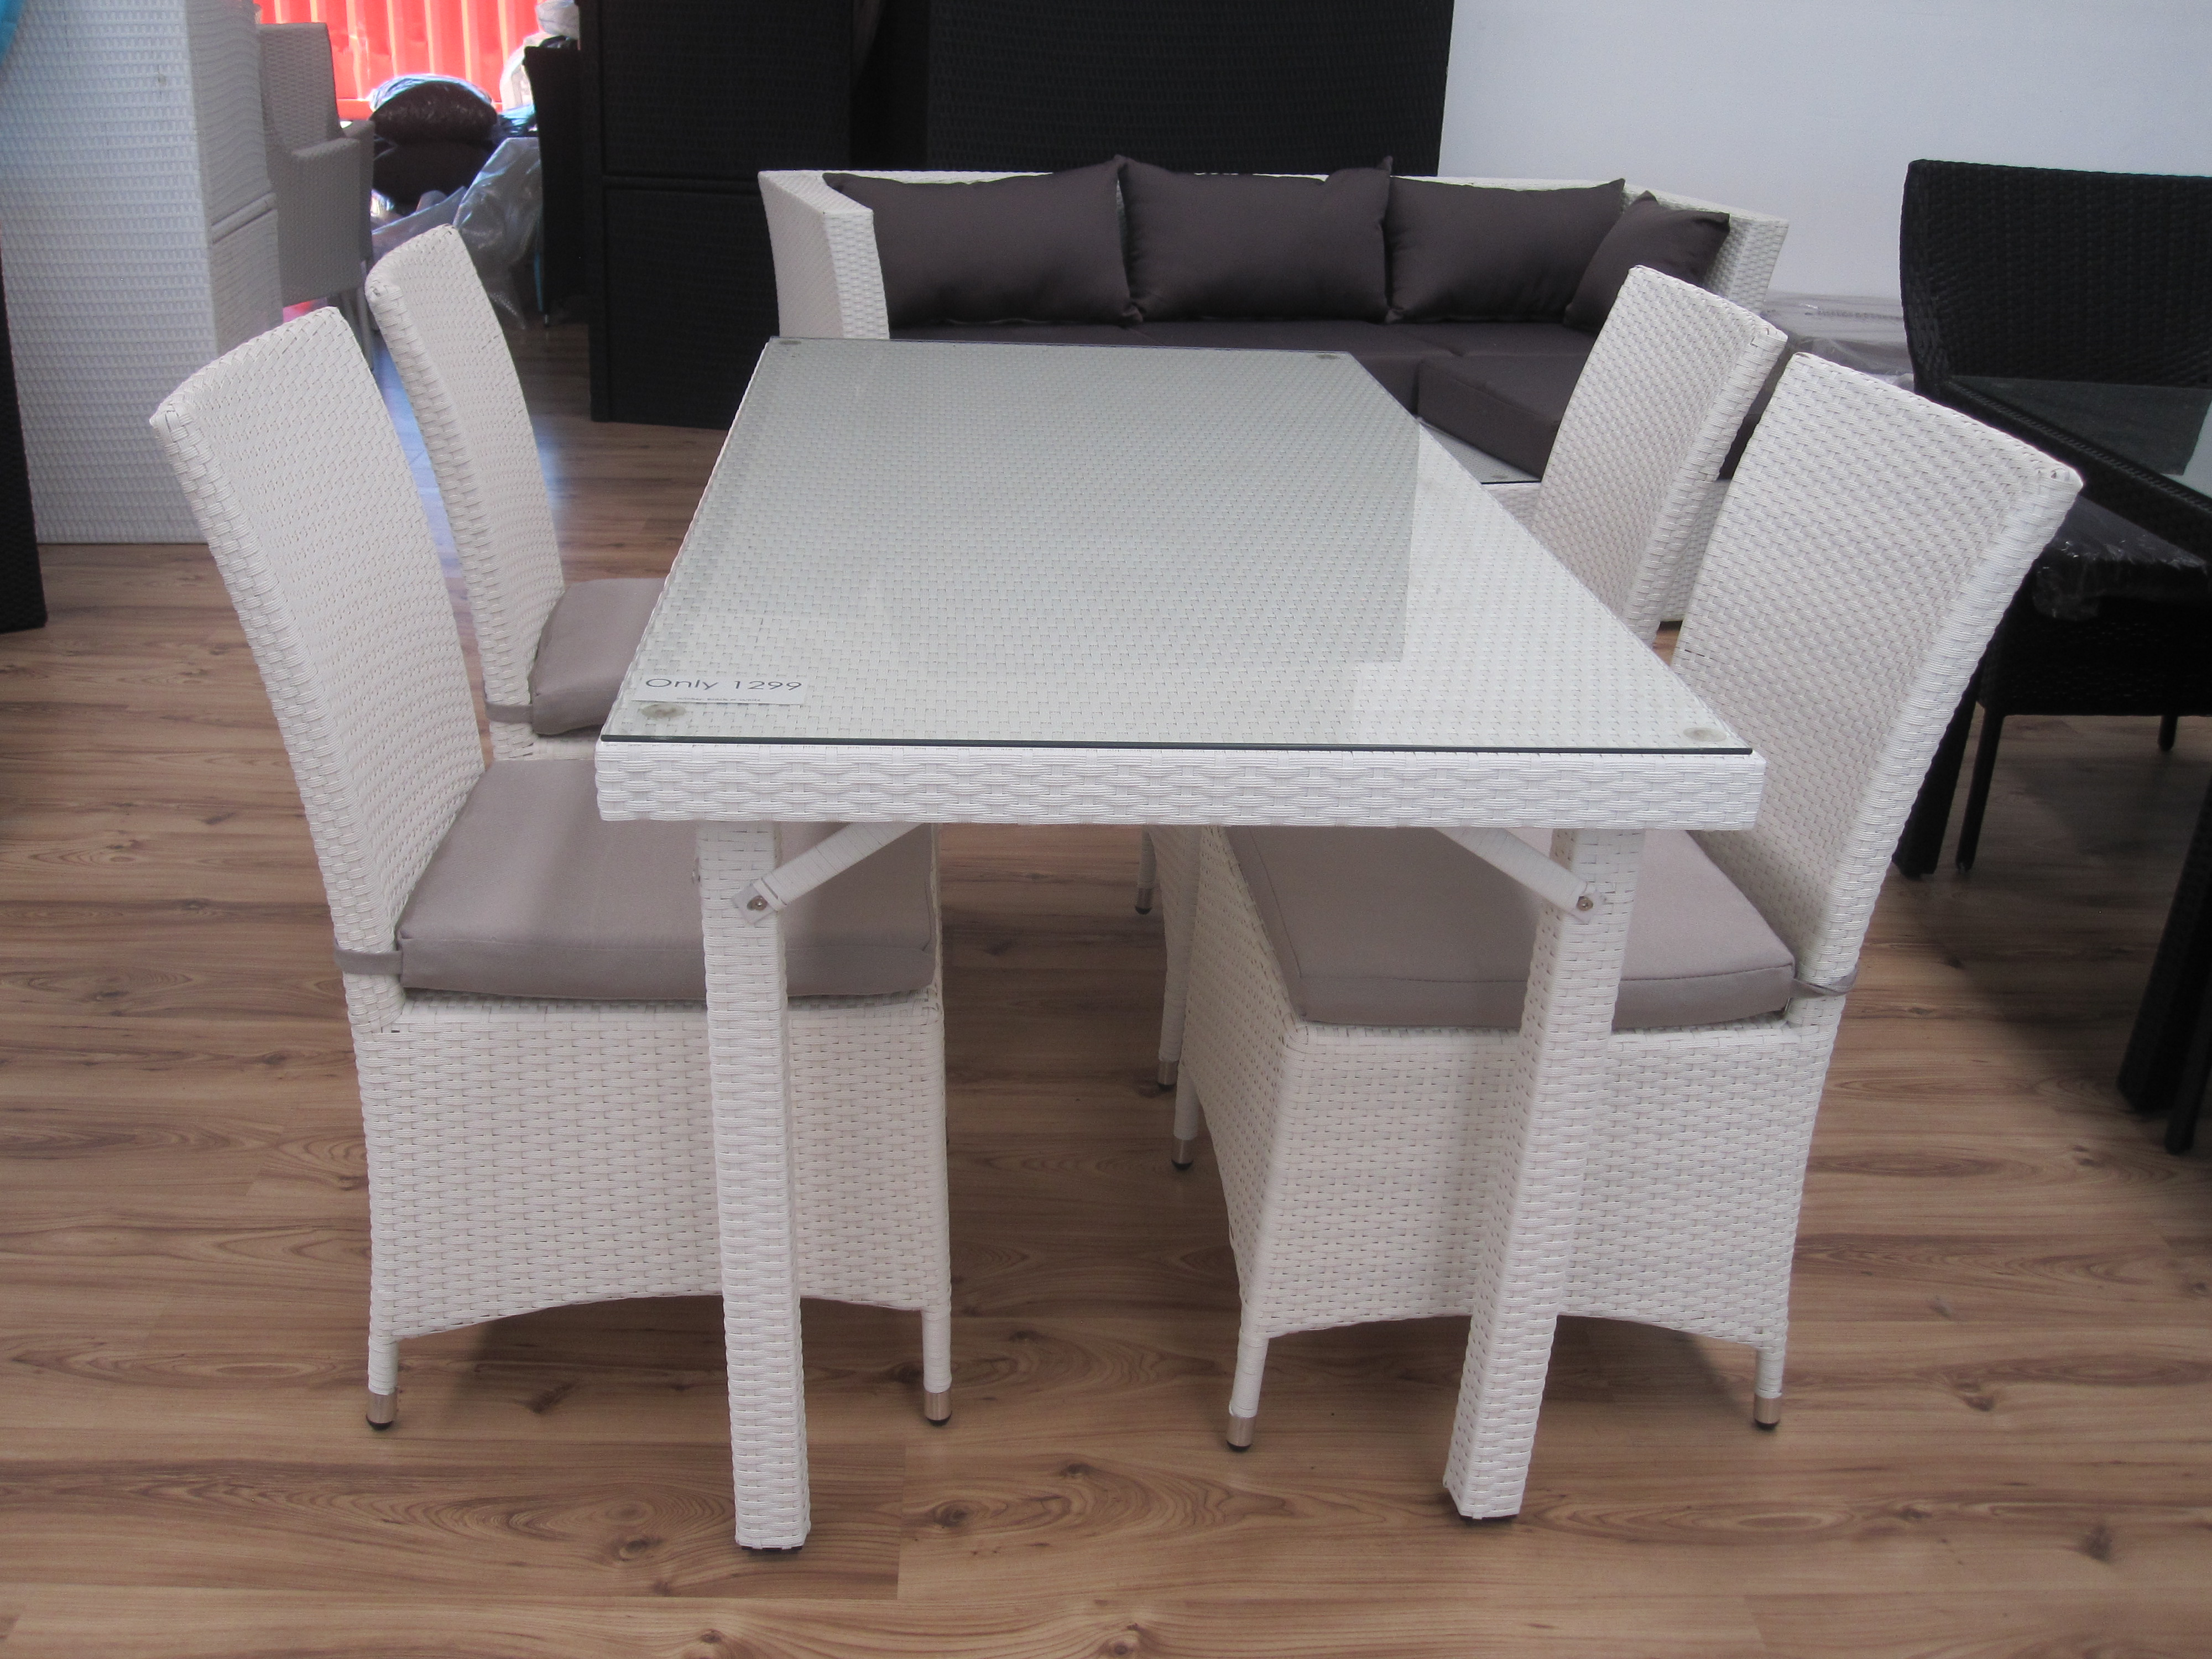 Pariso 4 Seat Patio Dining Set Urbani Furniture